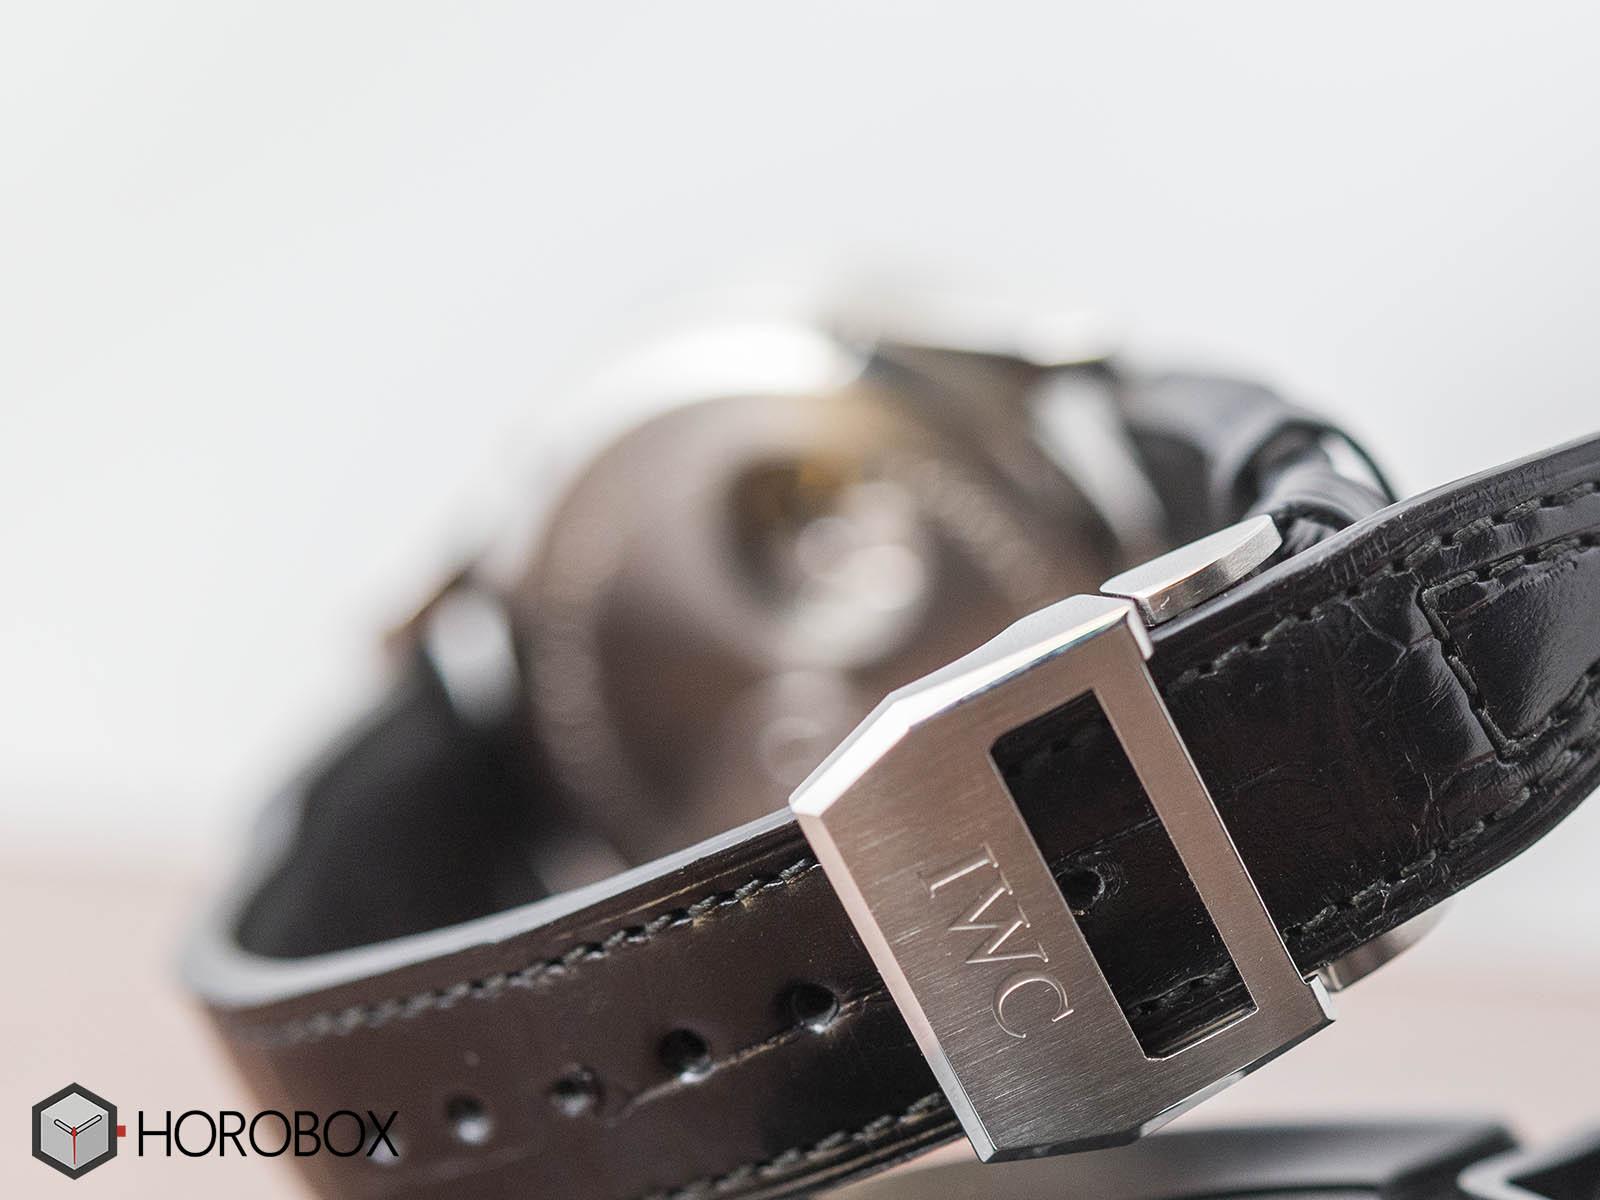 iw510504-iwc-Big-Pilot-s-Watch-Big-Date-Edition-150-Years-Sihh2018-6.jpg